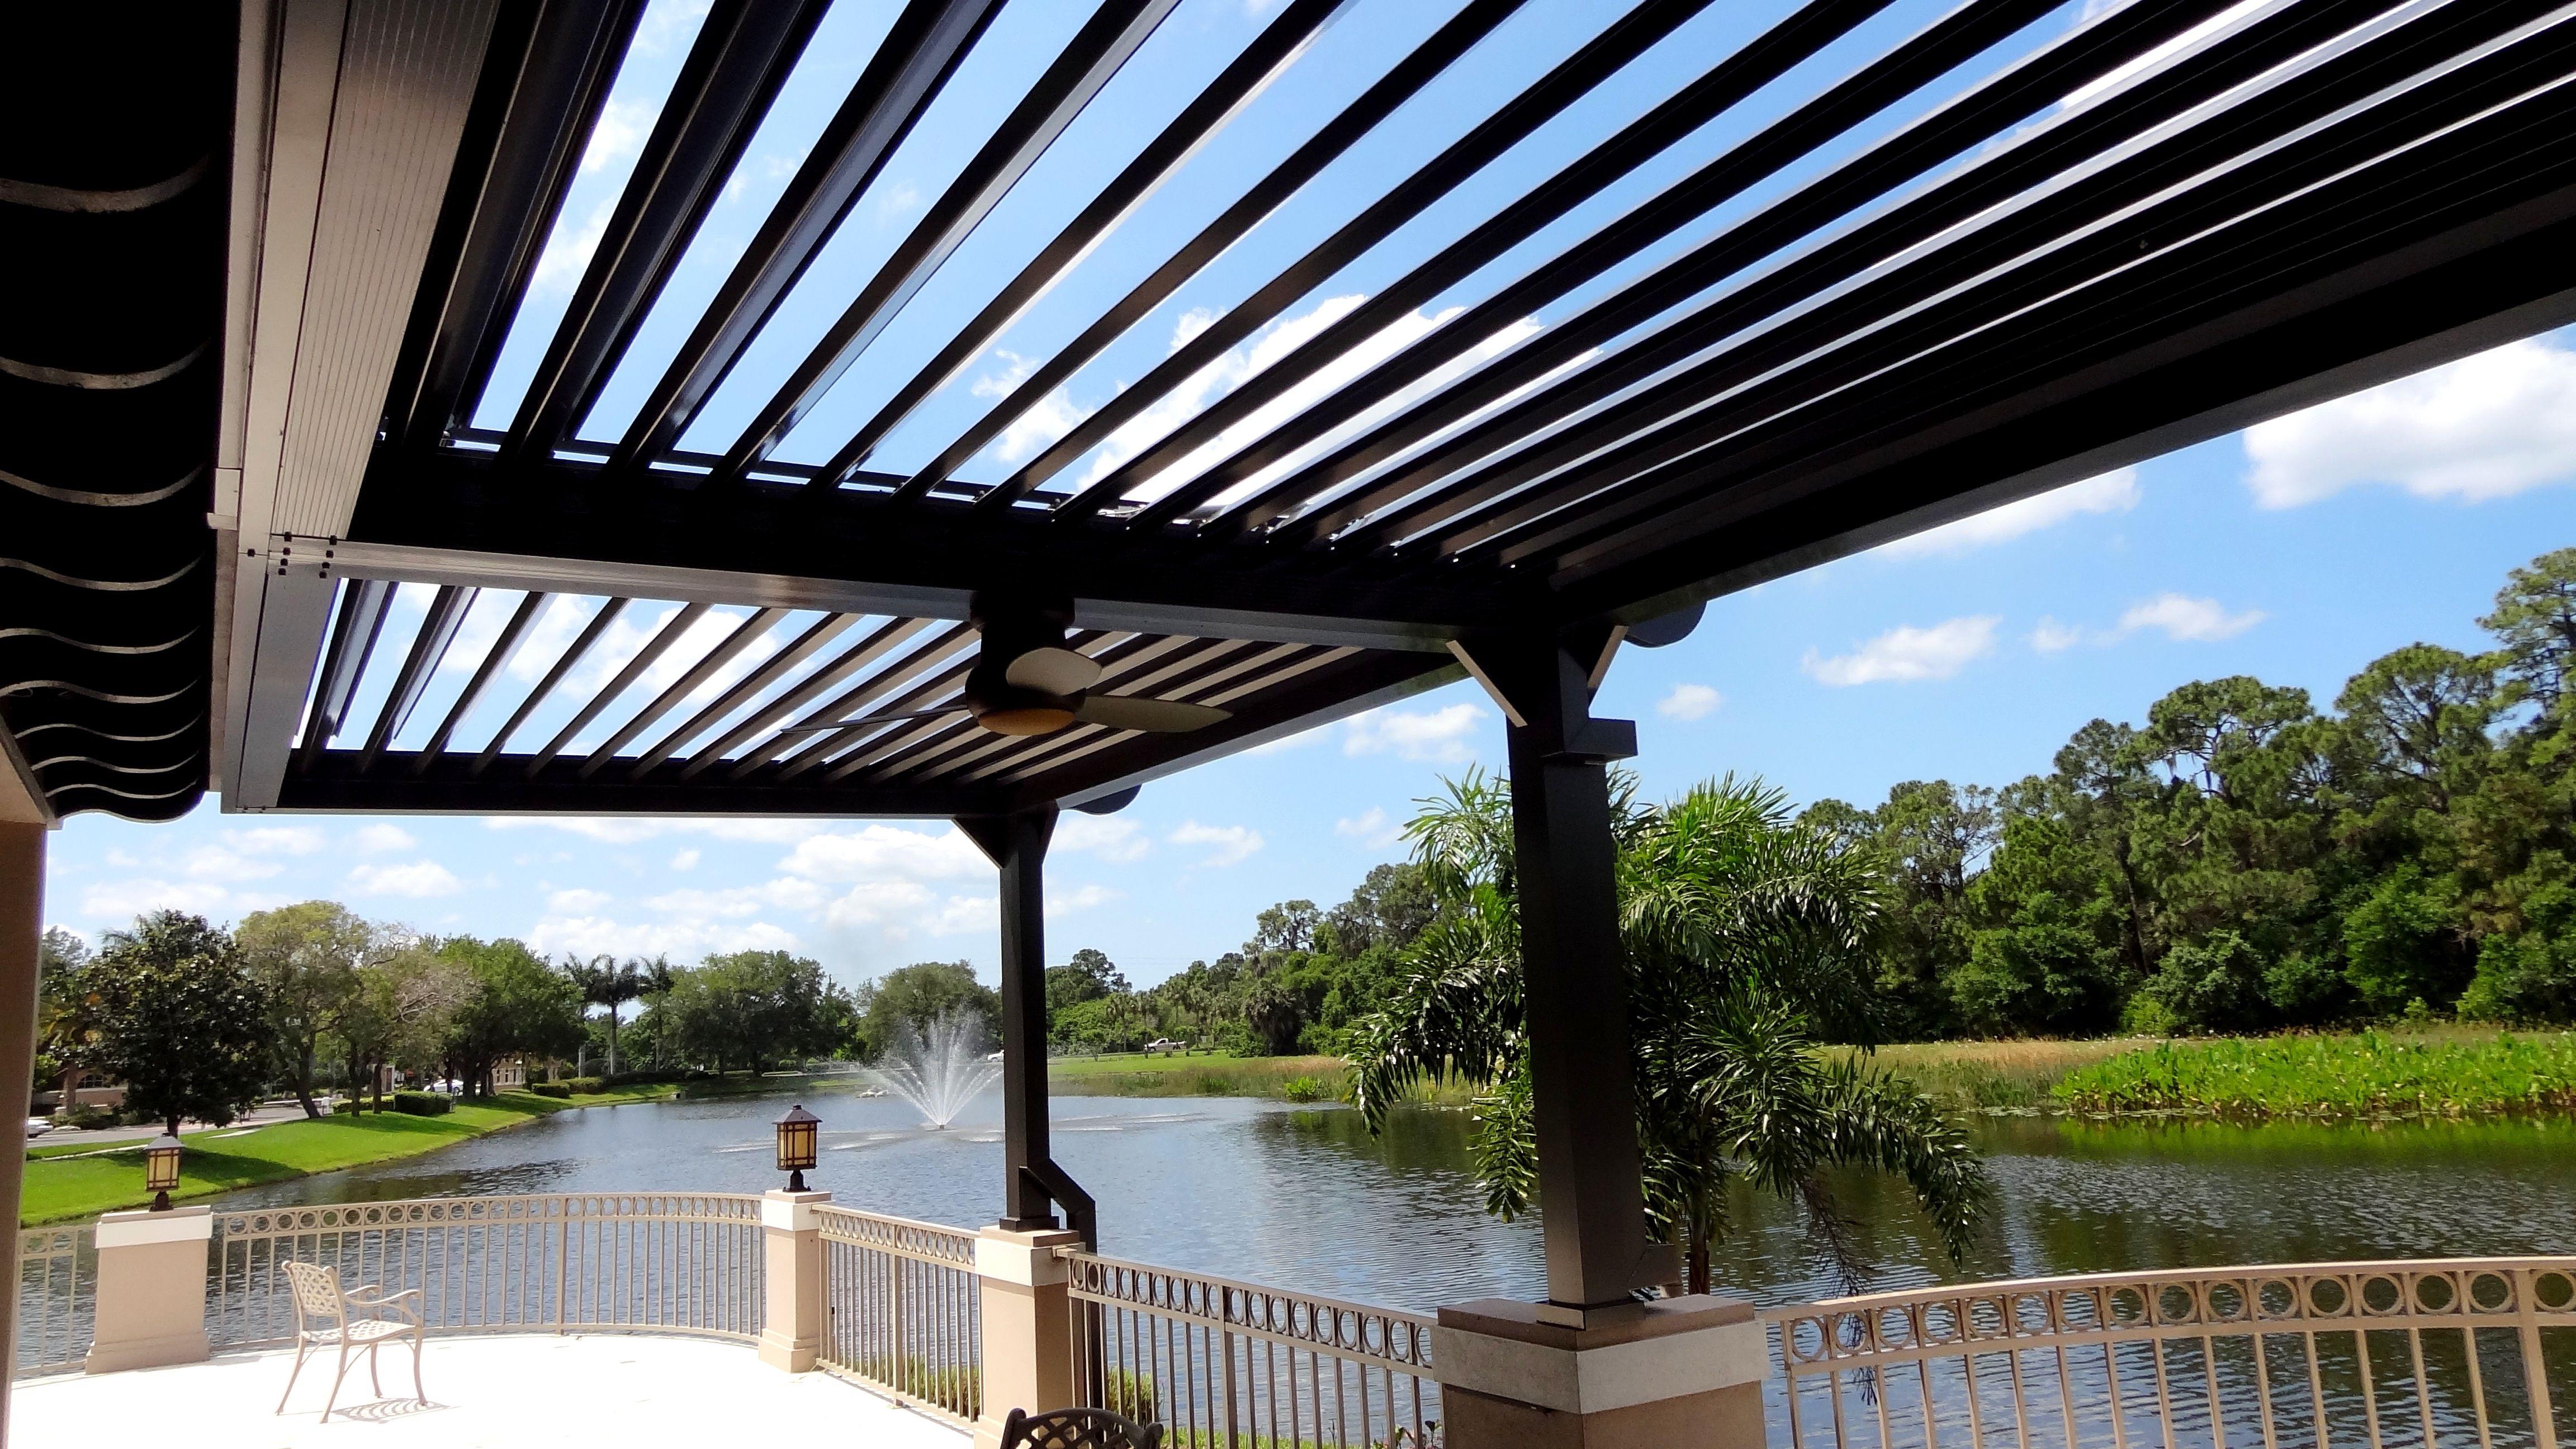 Adjustable & Fixed Roof Systems Pergola, Portable gazebo